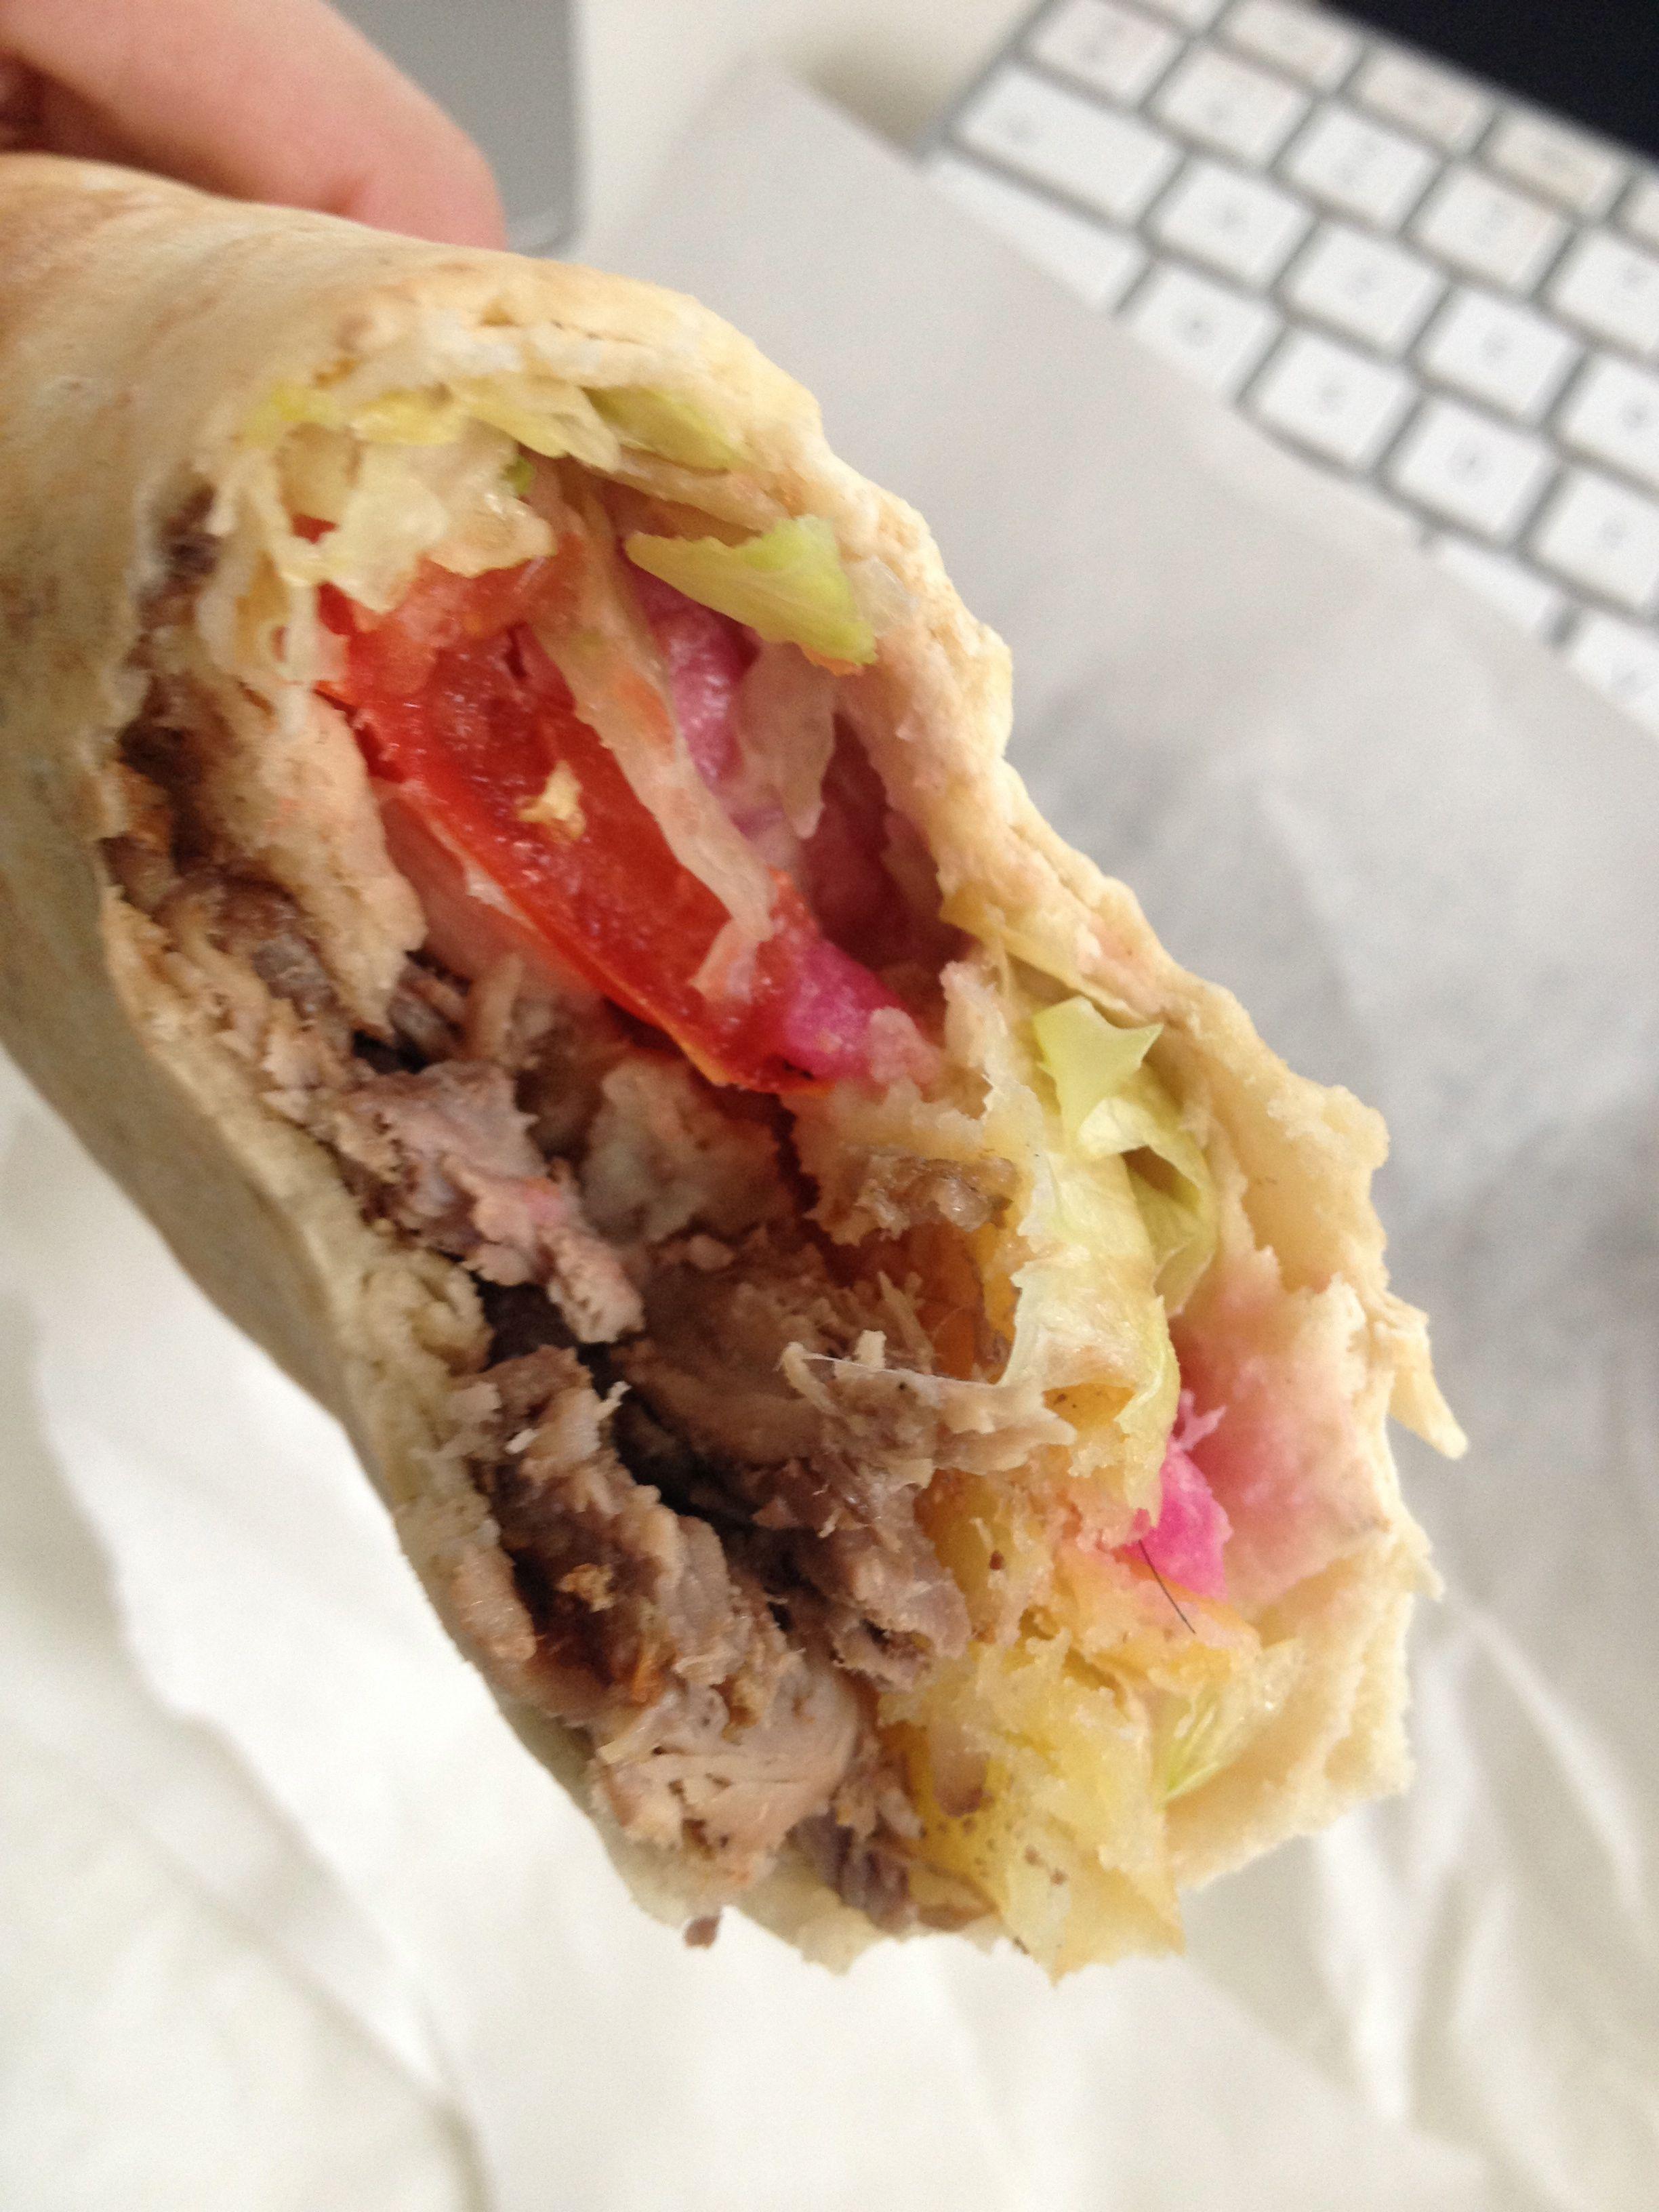 Shawarma viande - St Eustache Chawarma à Paris